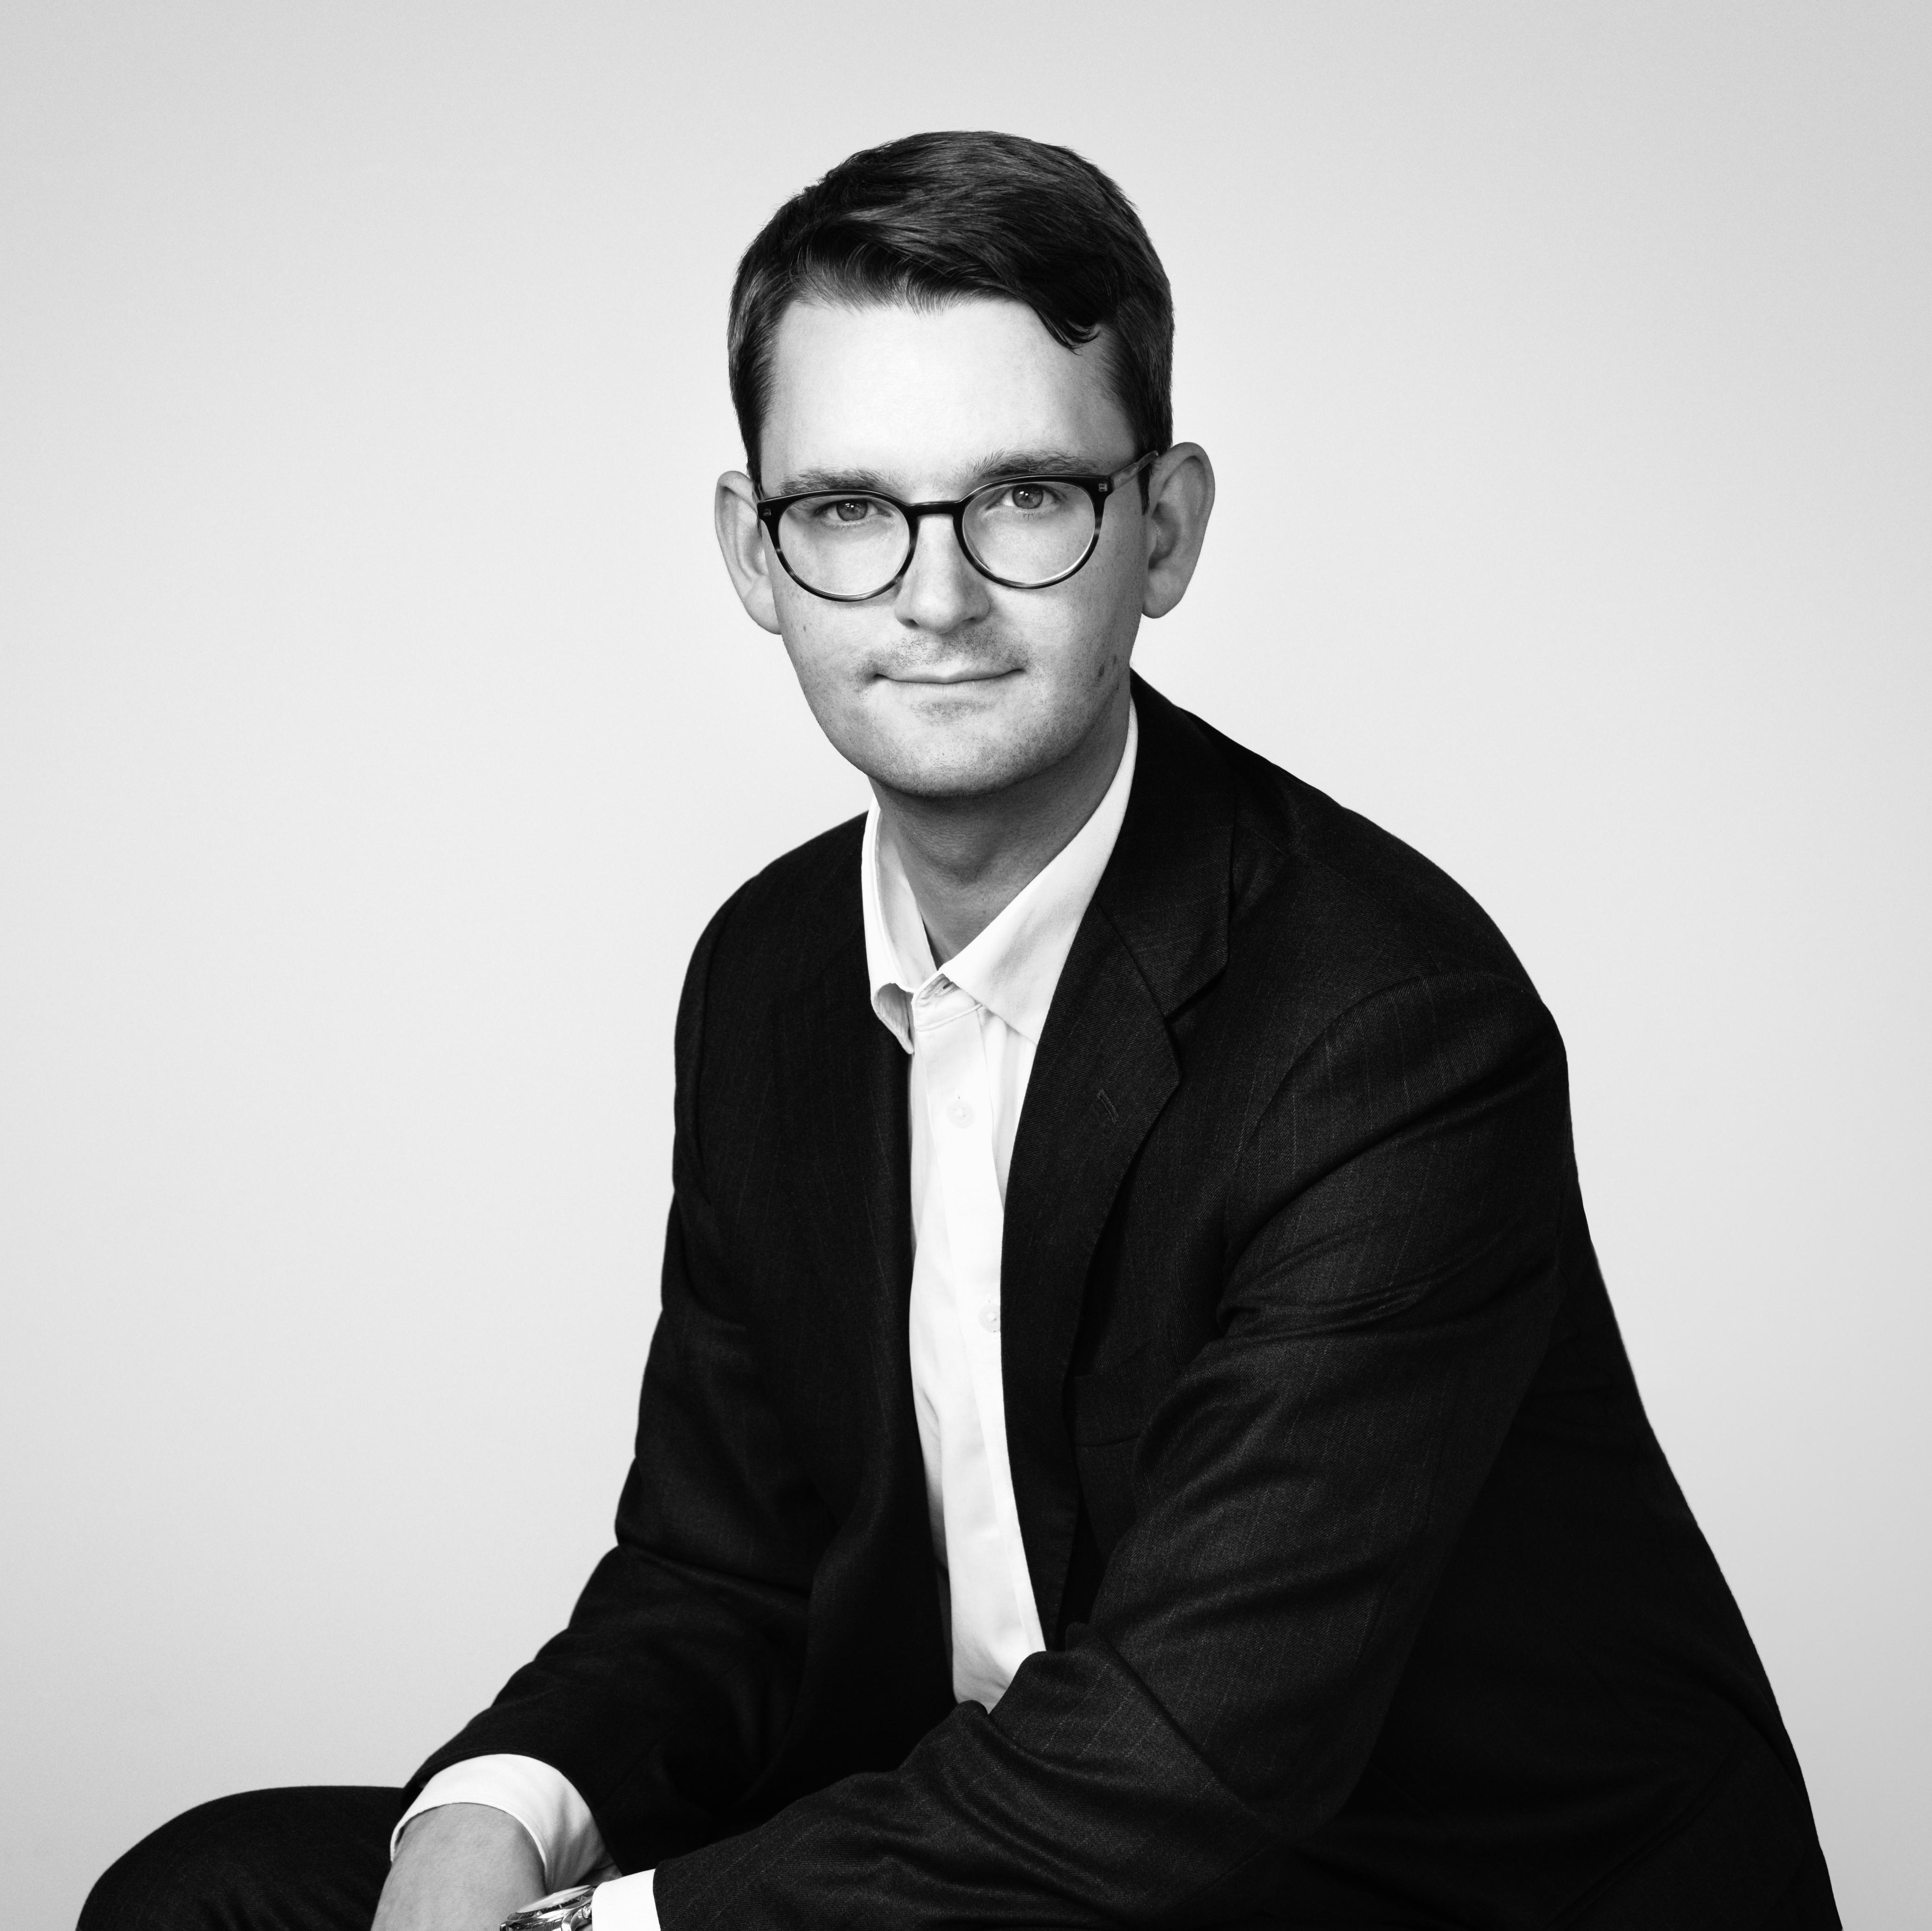 Foto: Nikolaus Leutgöb